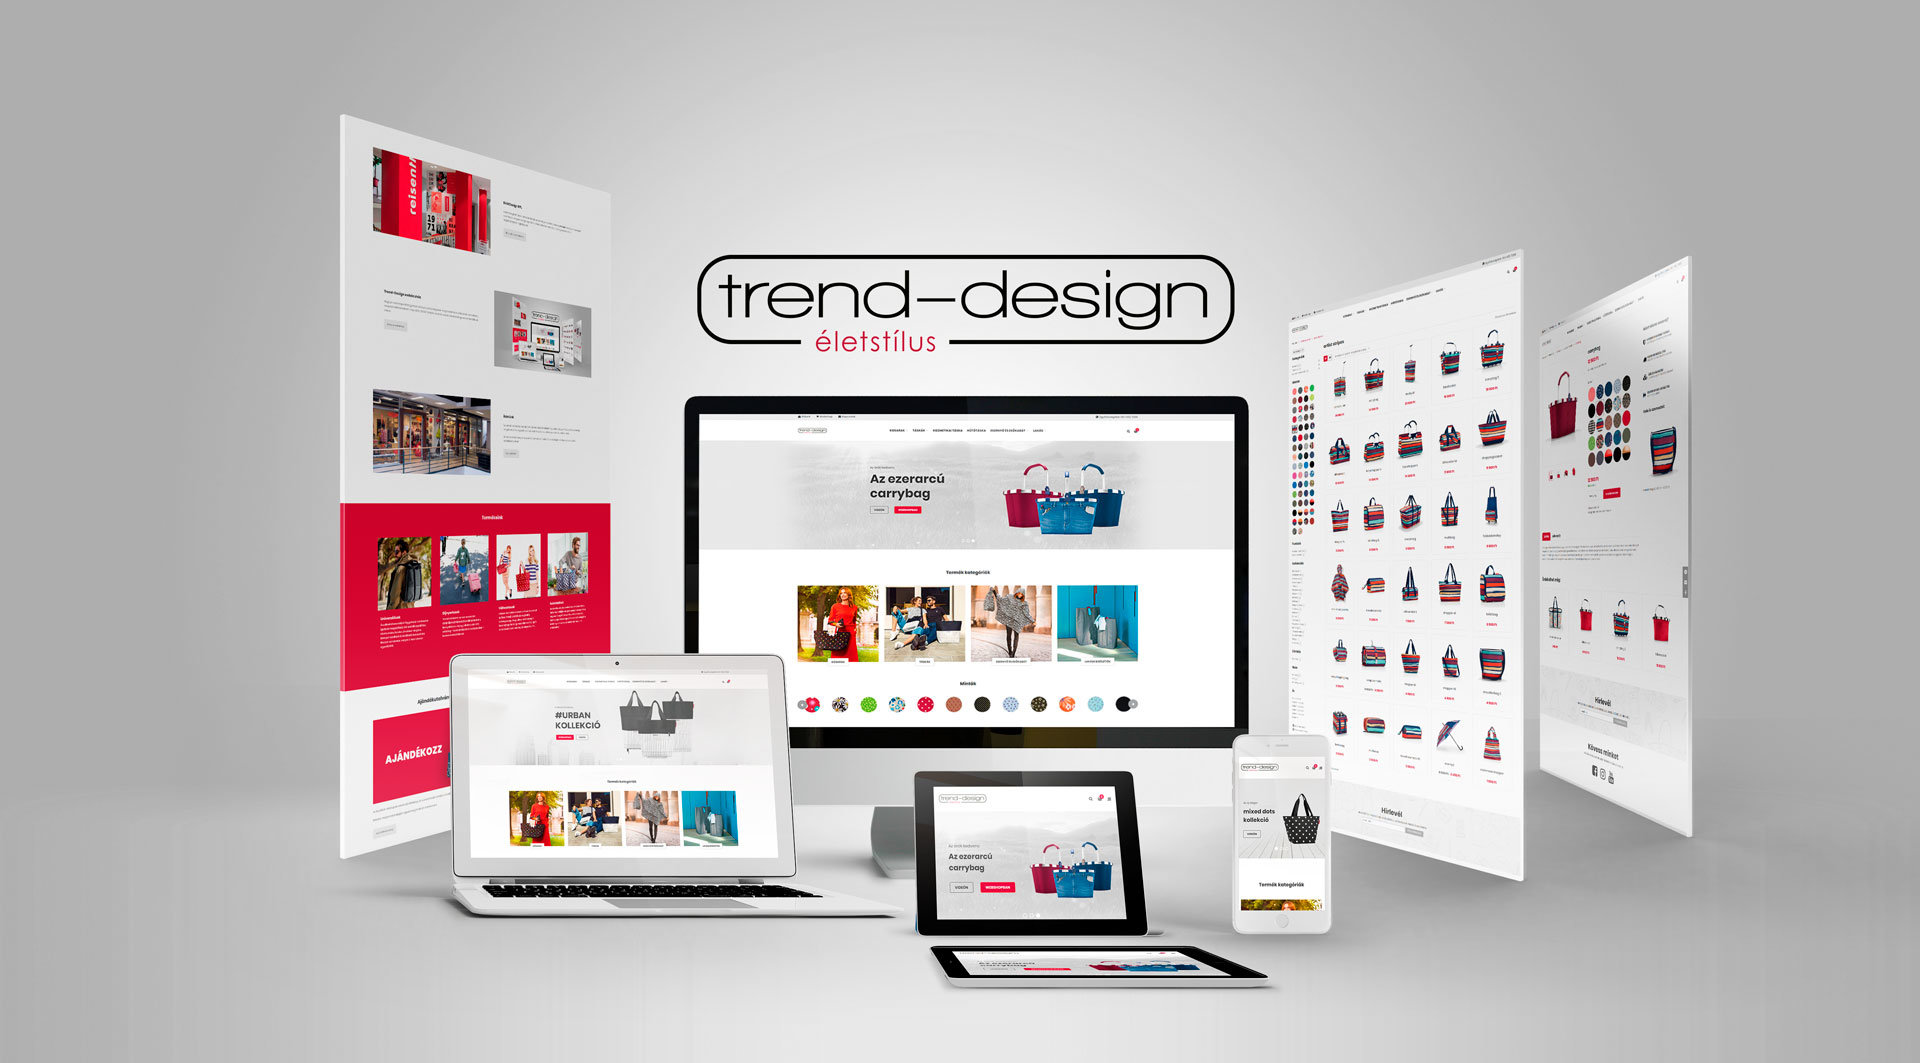 20076d3f69e8 Rólunk - Trend - Design